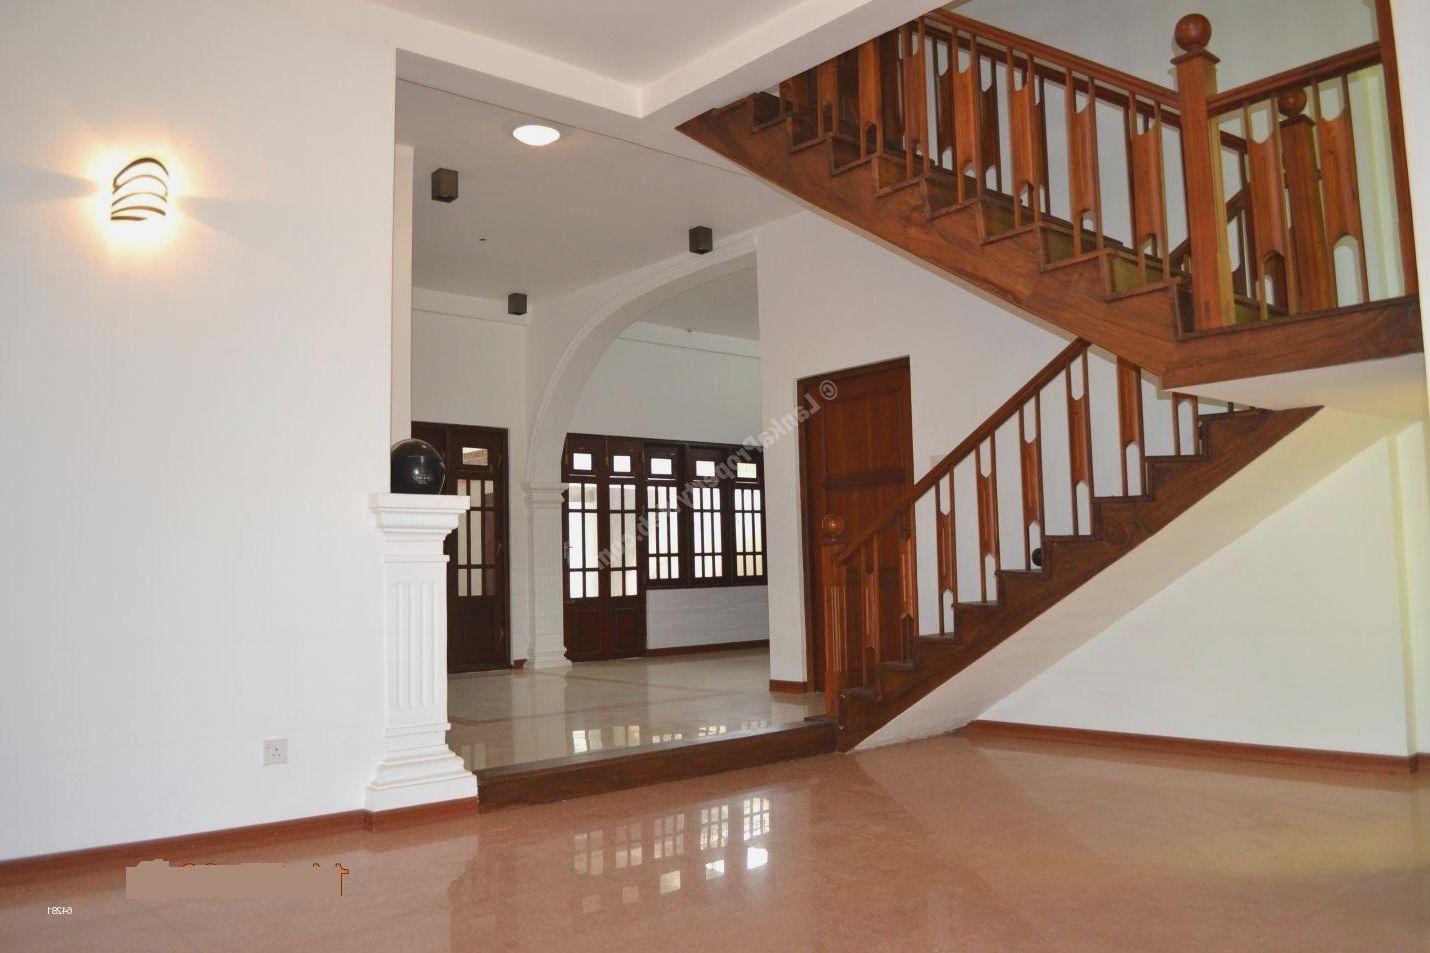 Sri Lanka House Roof Designs Modern Home Design House Roof Design Modern Roof Design Roof Design